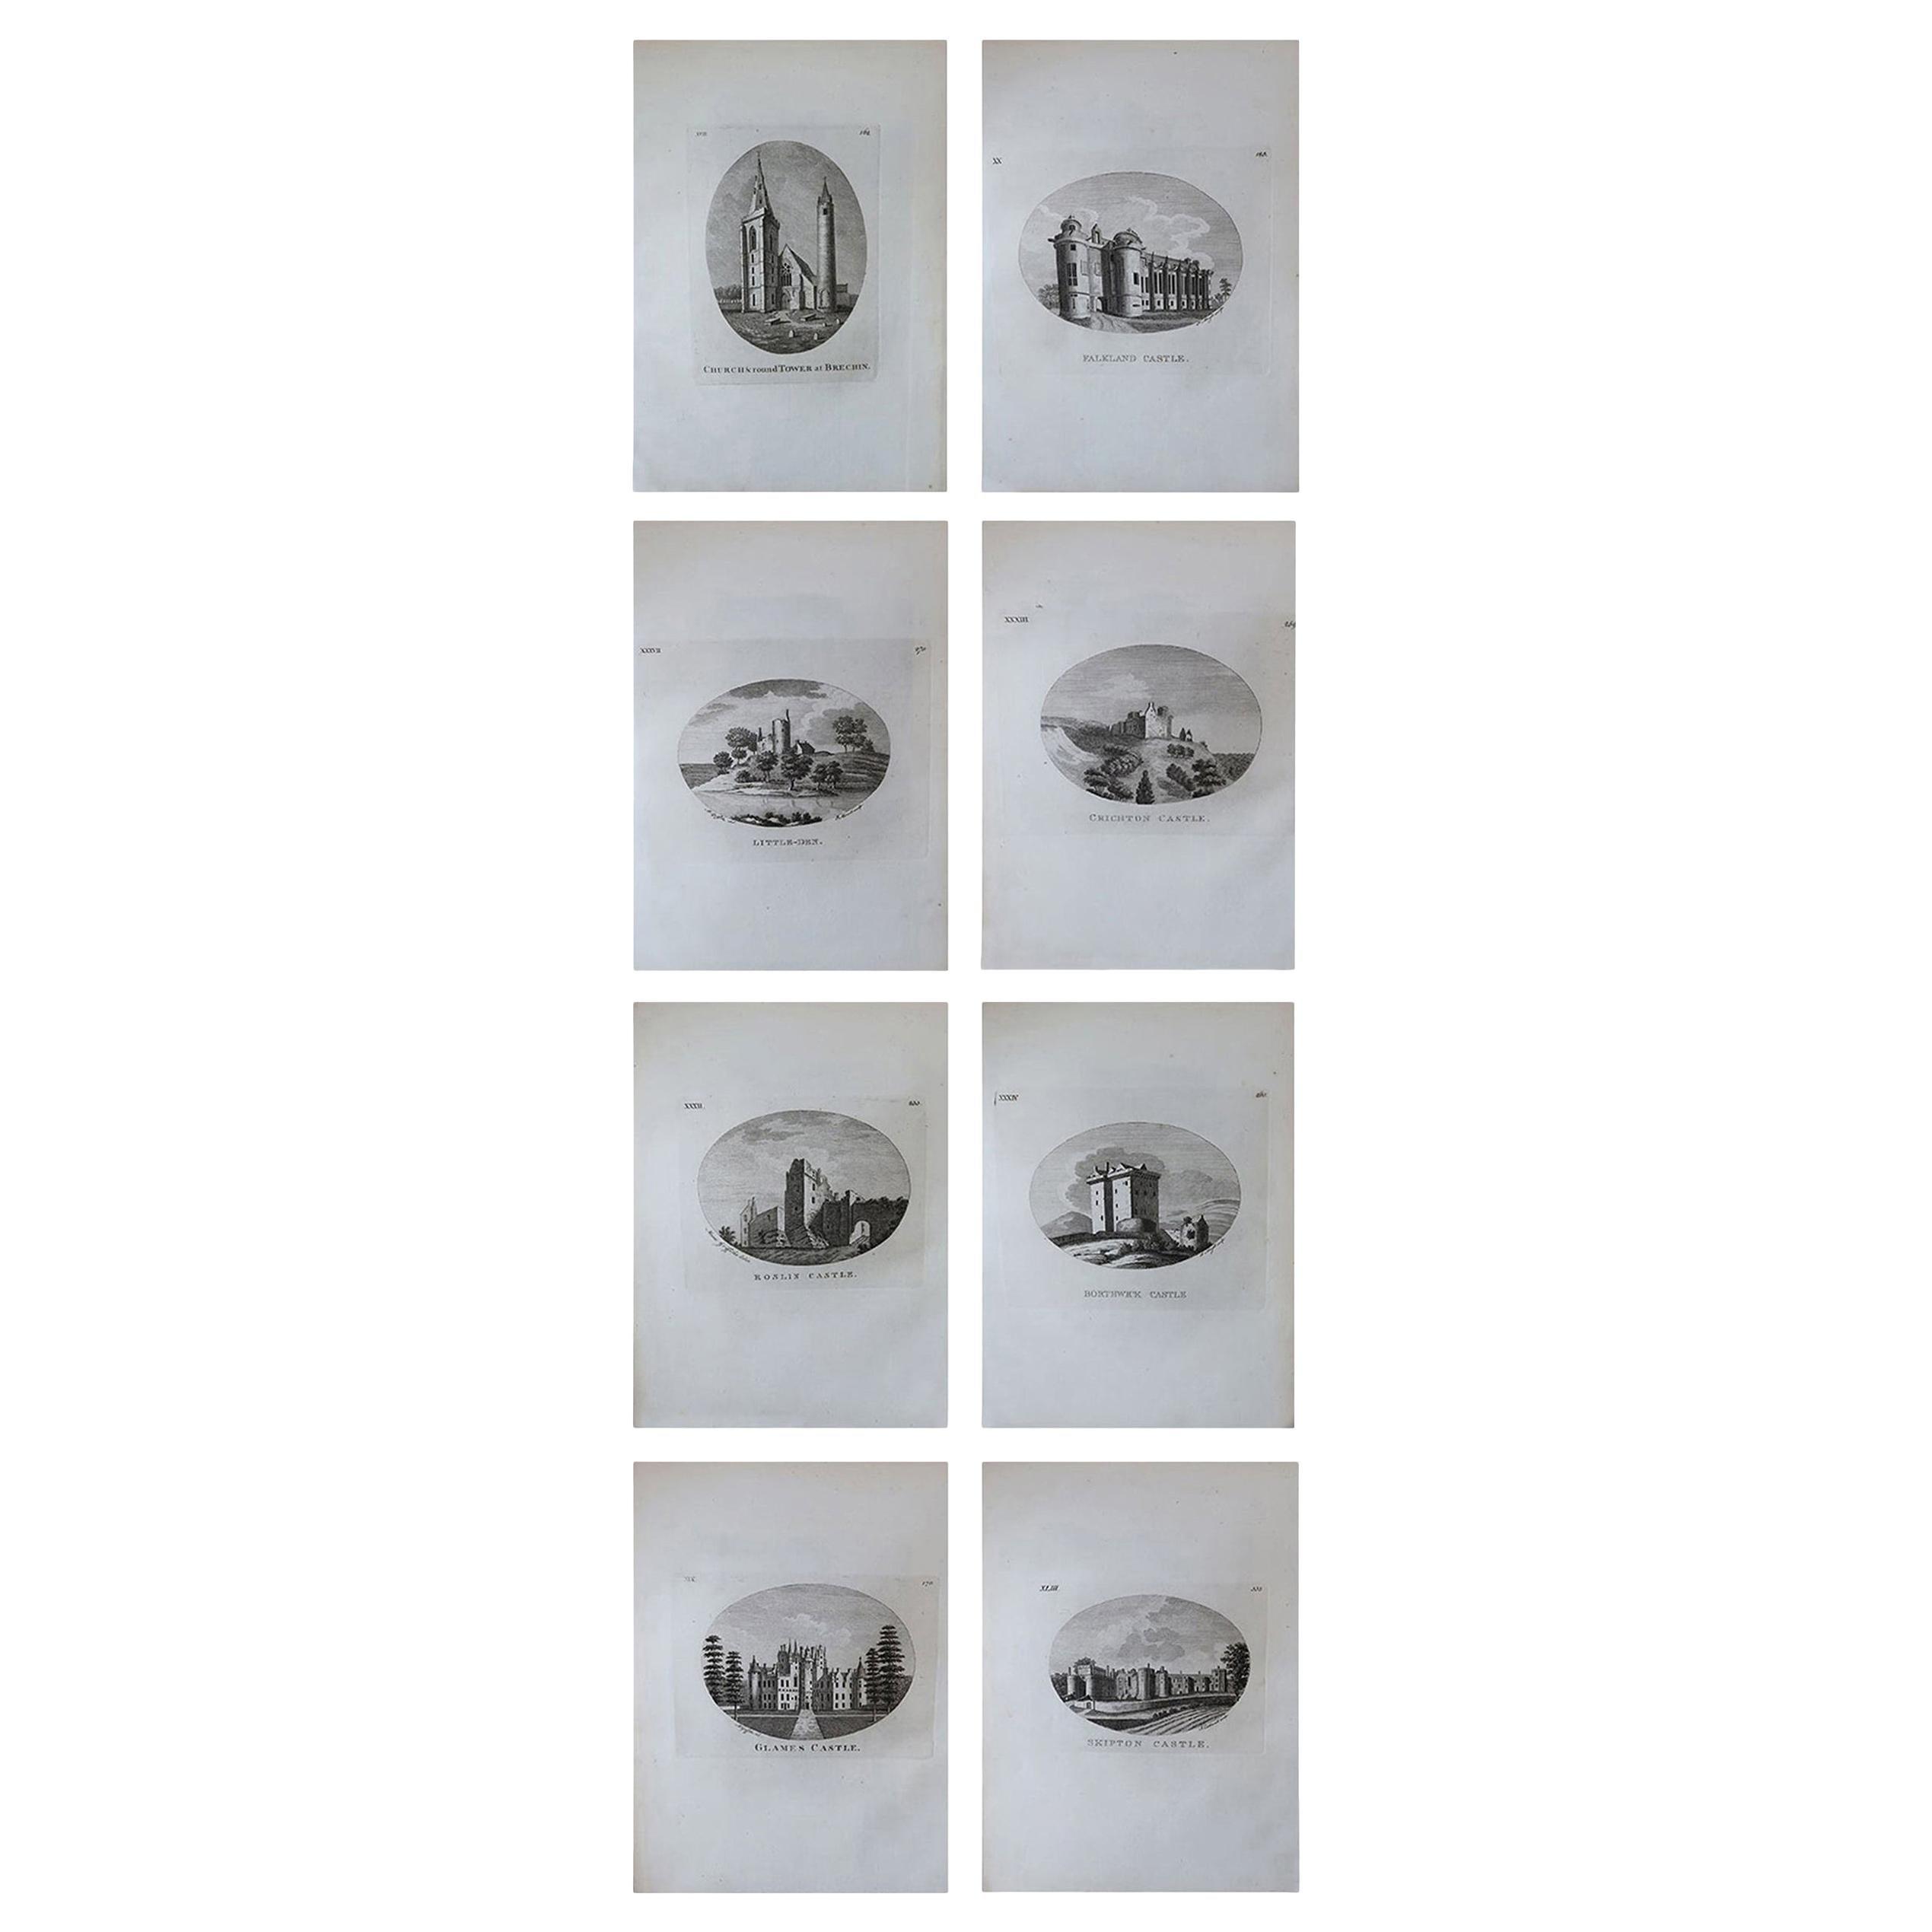 Set of 8 Antique Prints of Scottish Castles, circa 1770